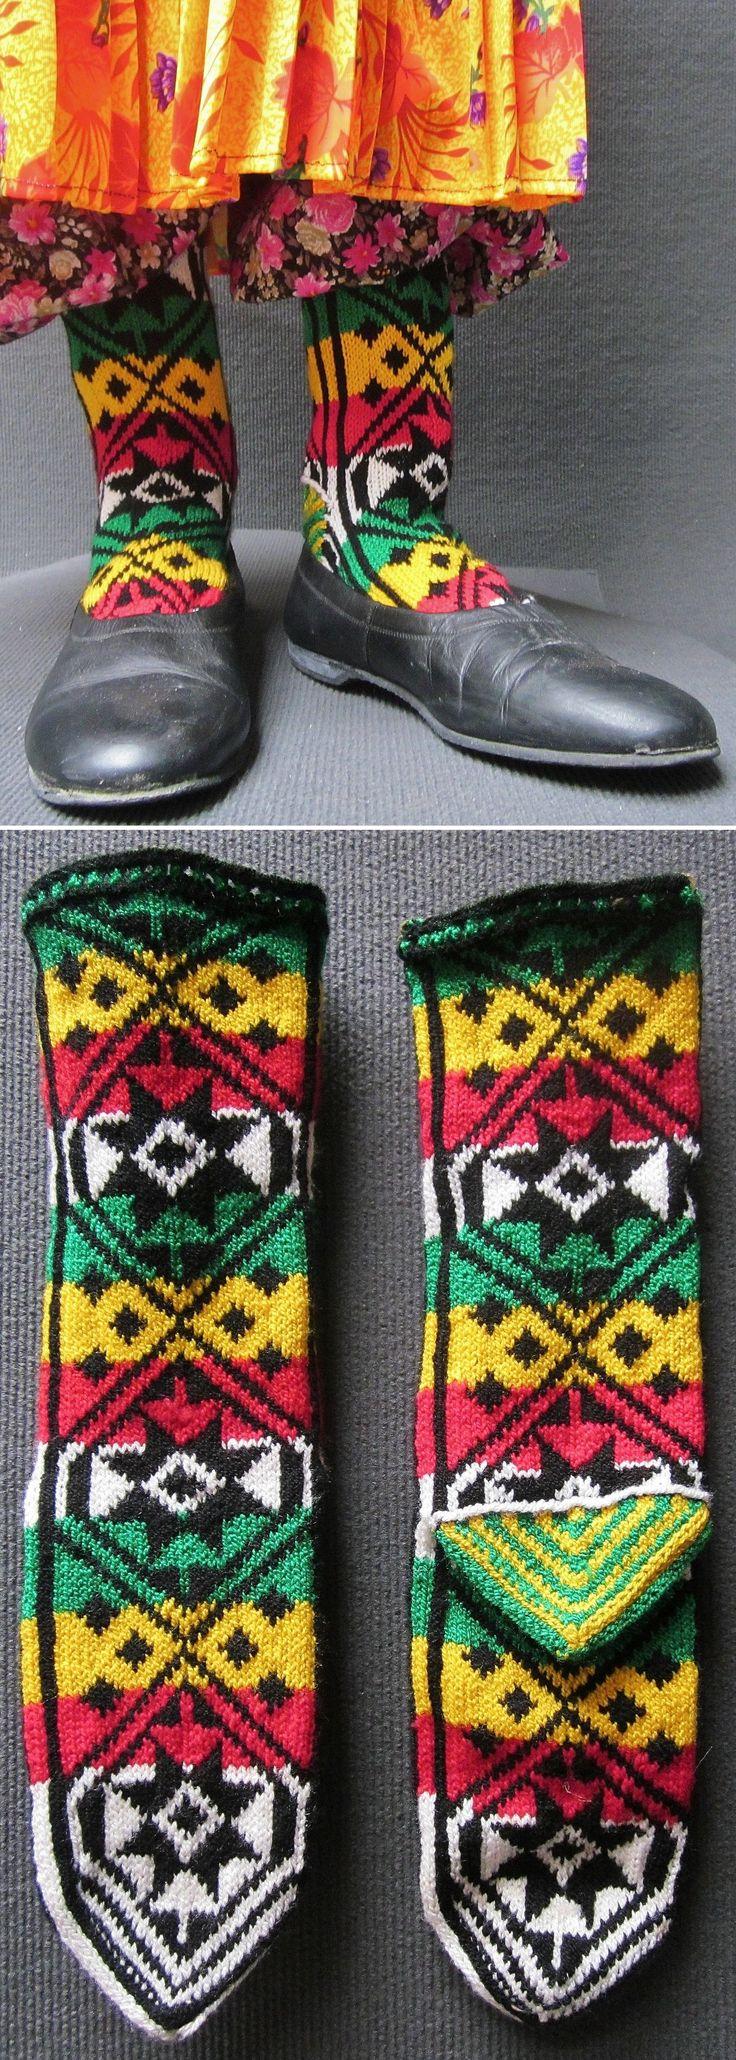 Handknitted woollen women's socks from the Şalpazarı-Tonya region (Trabzon province). Circa 1990. (Inv.nr. çor011 - Kavak Costume Collection-Antwerpen/Belgium).